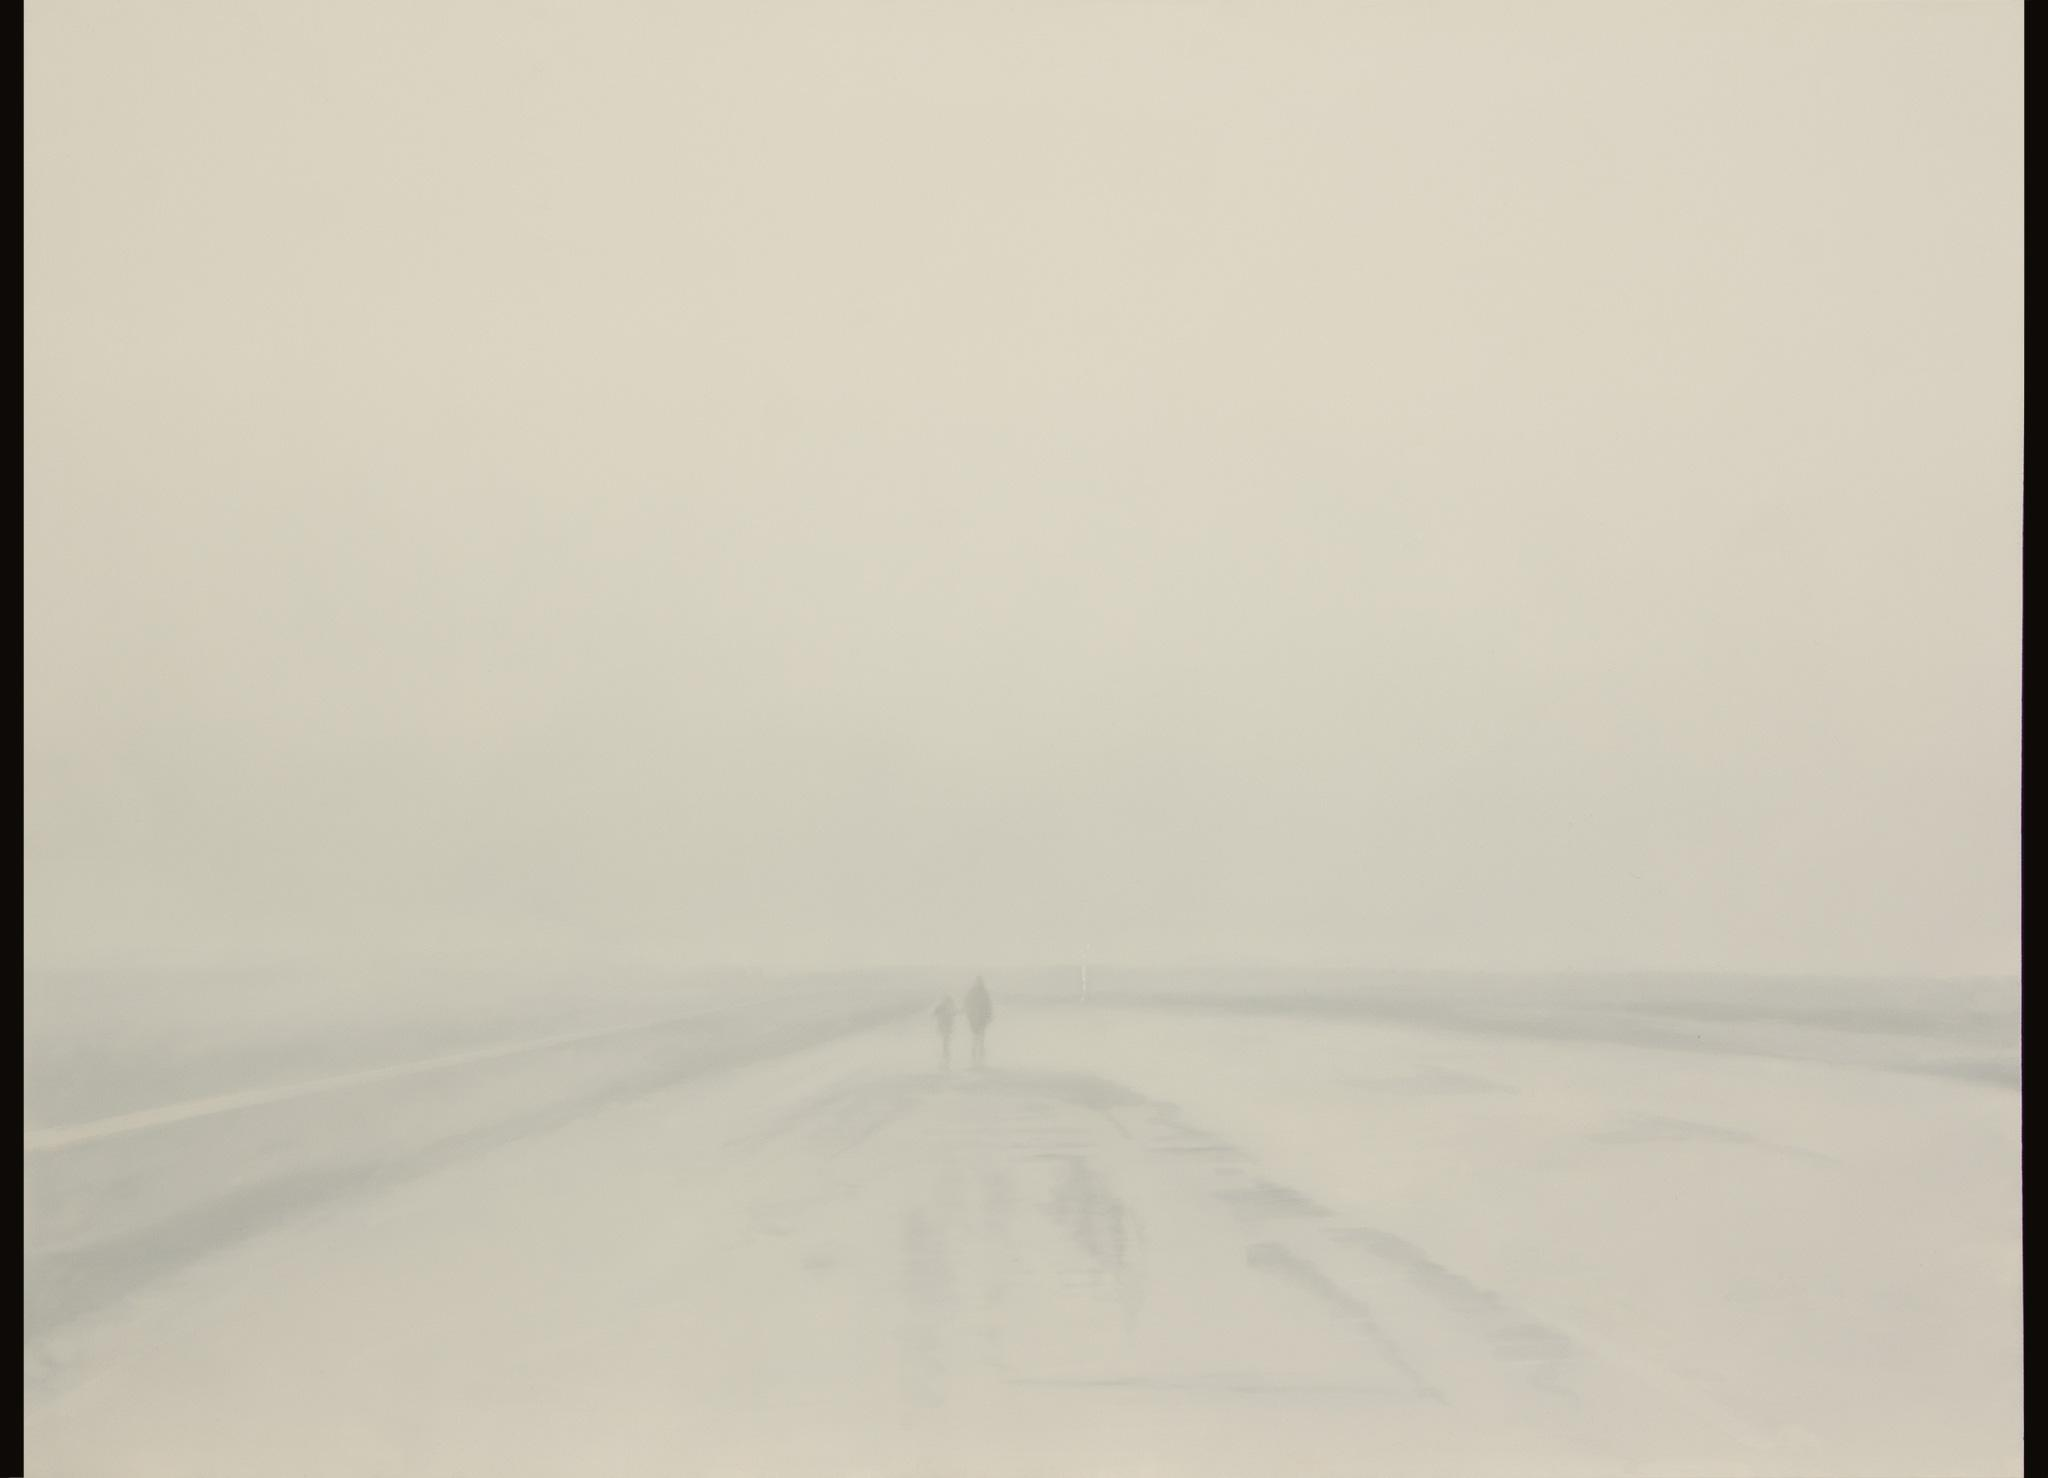 Road to a chimera Óleo sobre poliéster 80 x 110 cm 2019